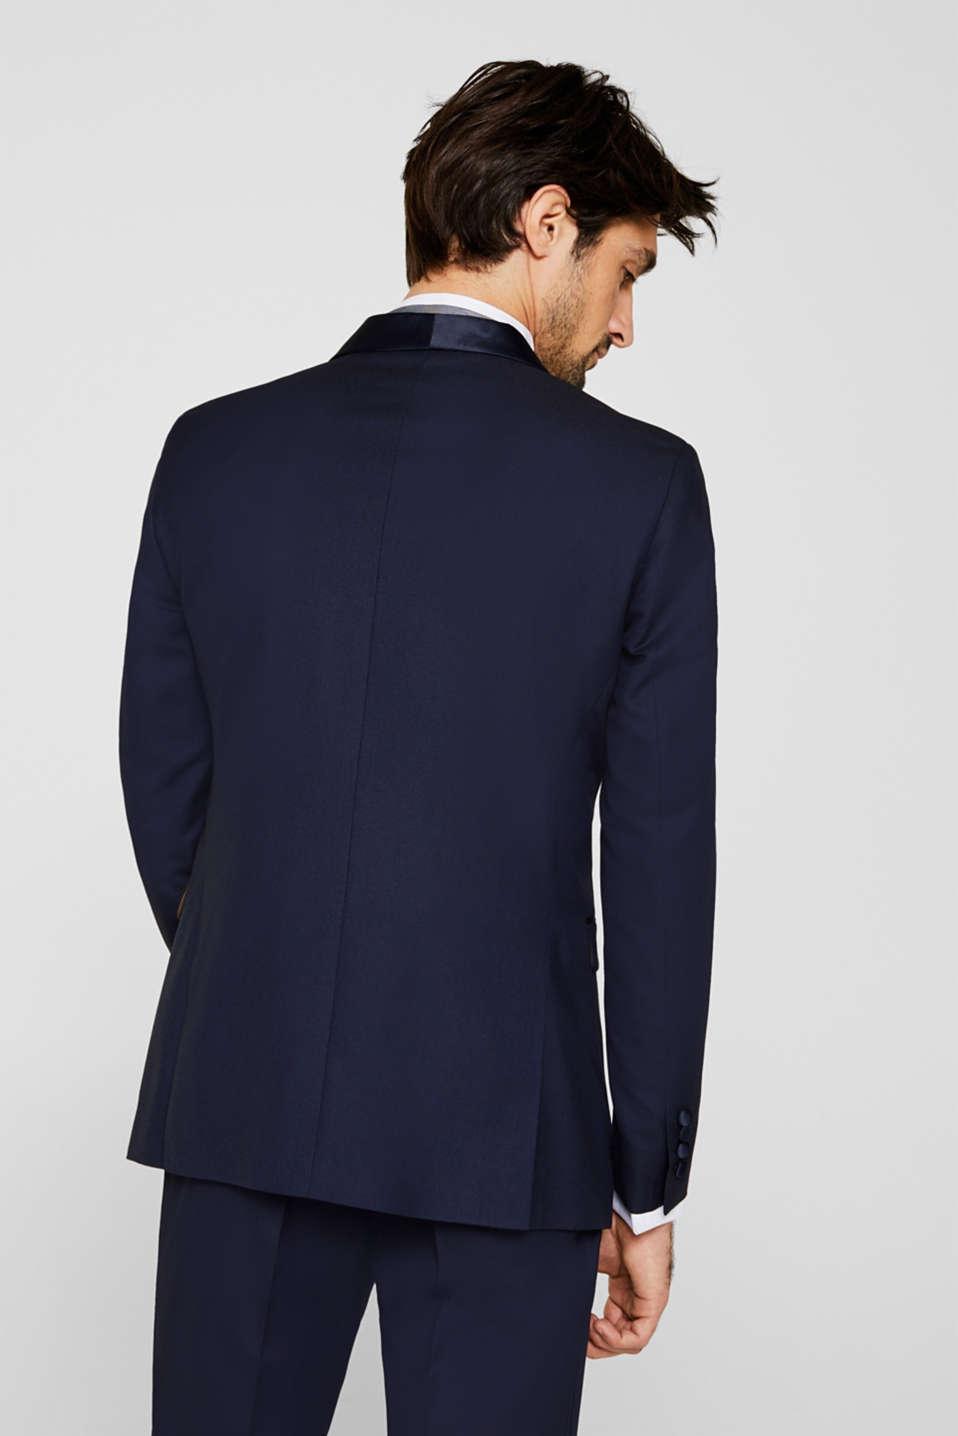 BLUE DINNER JACKET Mix + Match: sports jacket, NAVY, detail image number 3